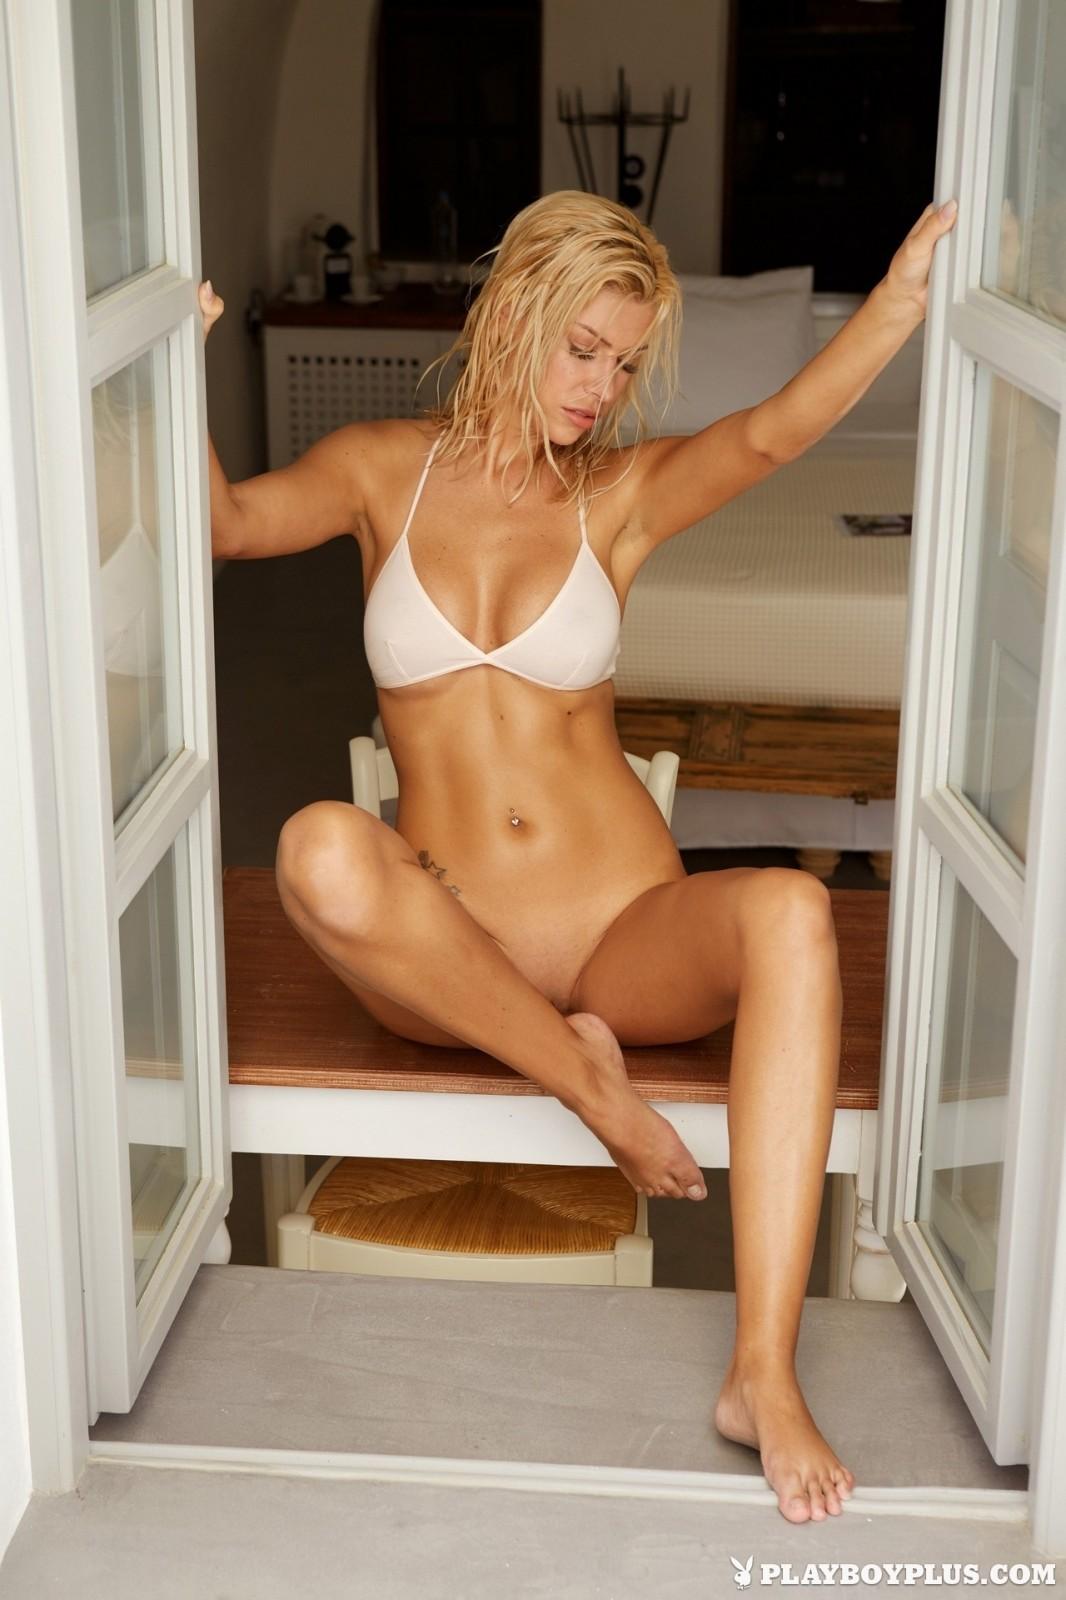 Naked Tanja Brockmann nudes (93 photos), Ass, Hot, Twitter, cleavage 2018